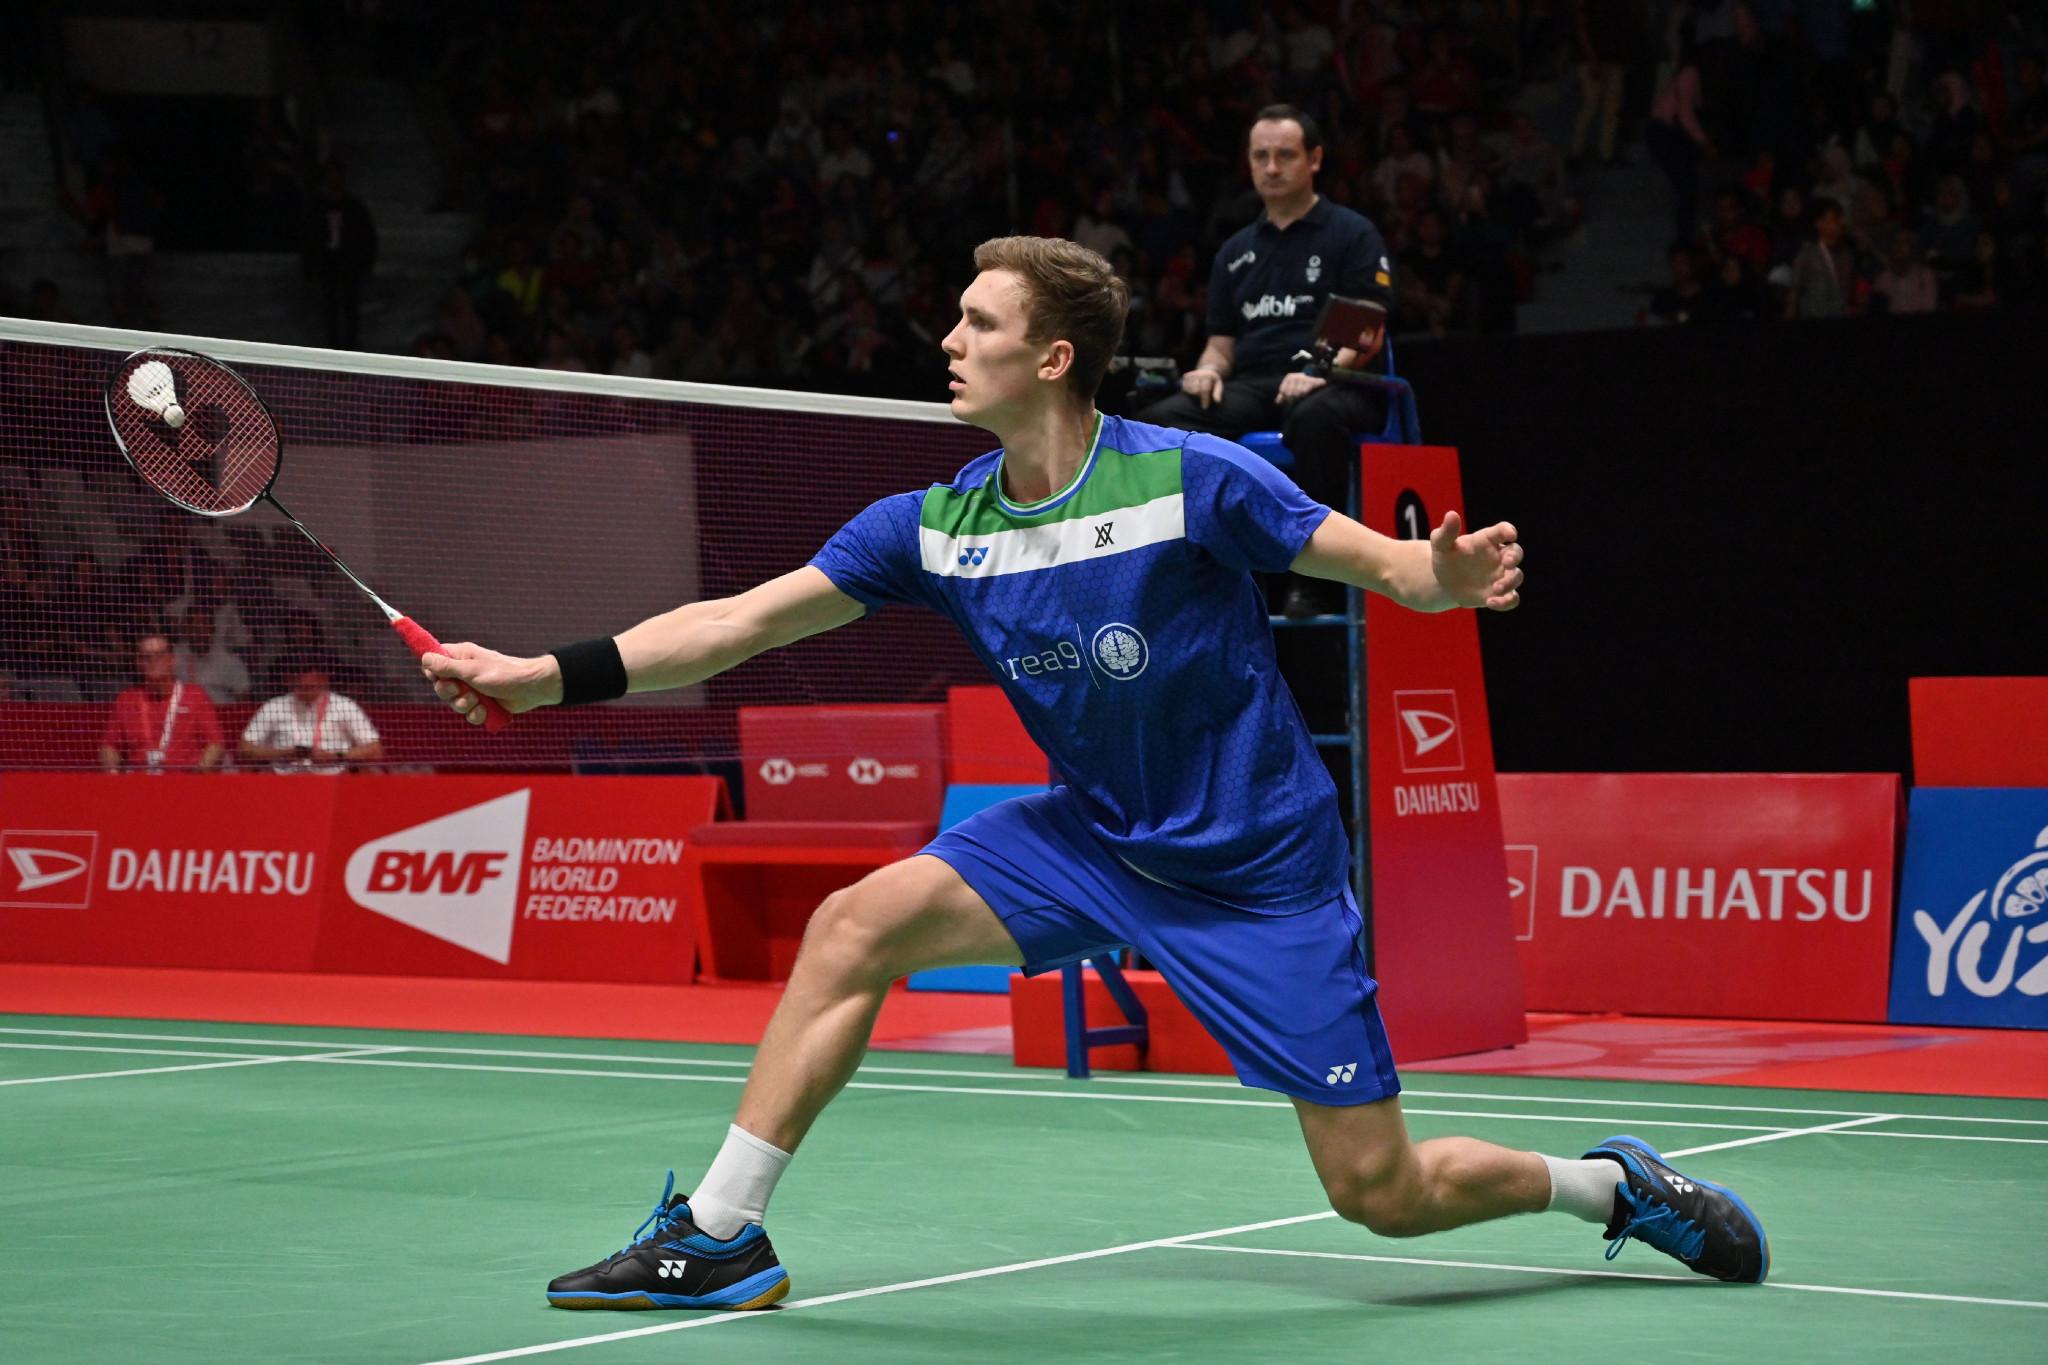 Denmark thrash Latvia to continue winning start at European Team Badminton Championships